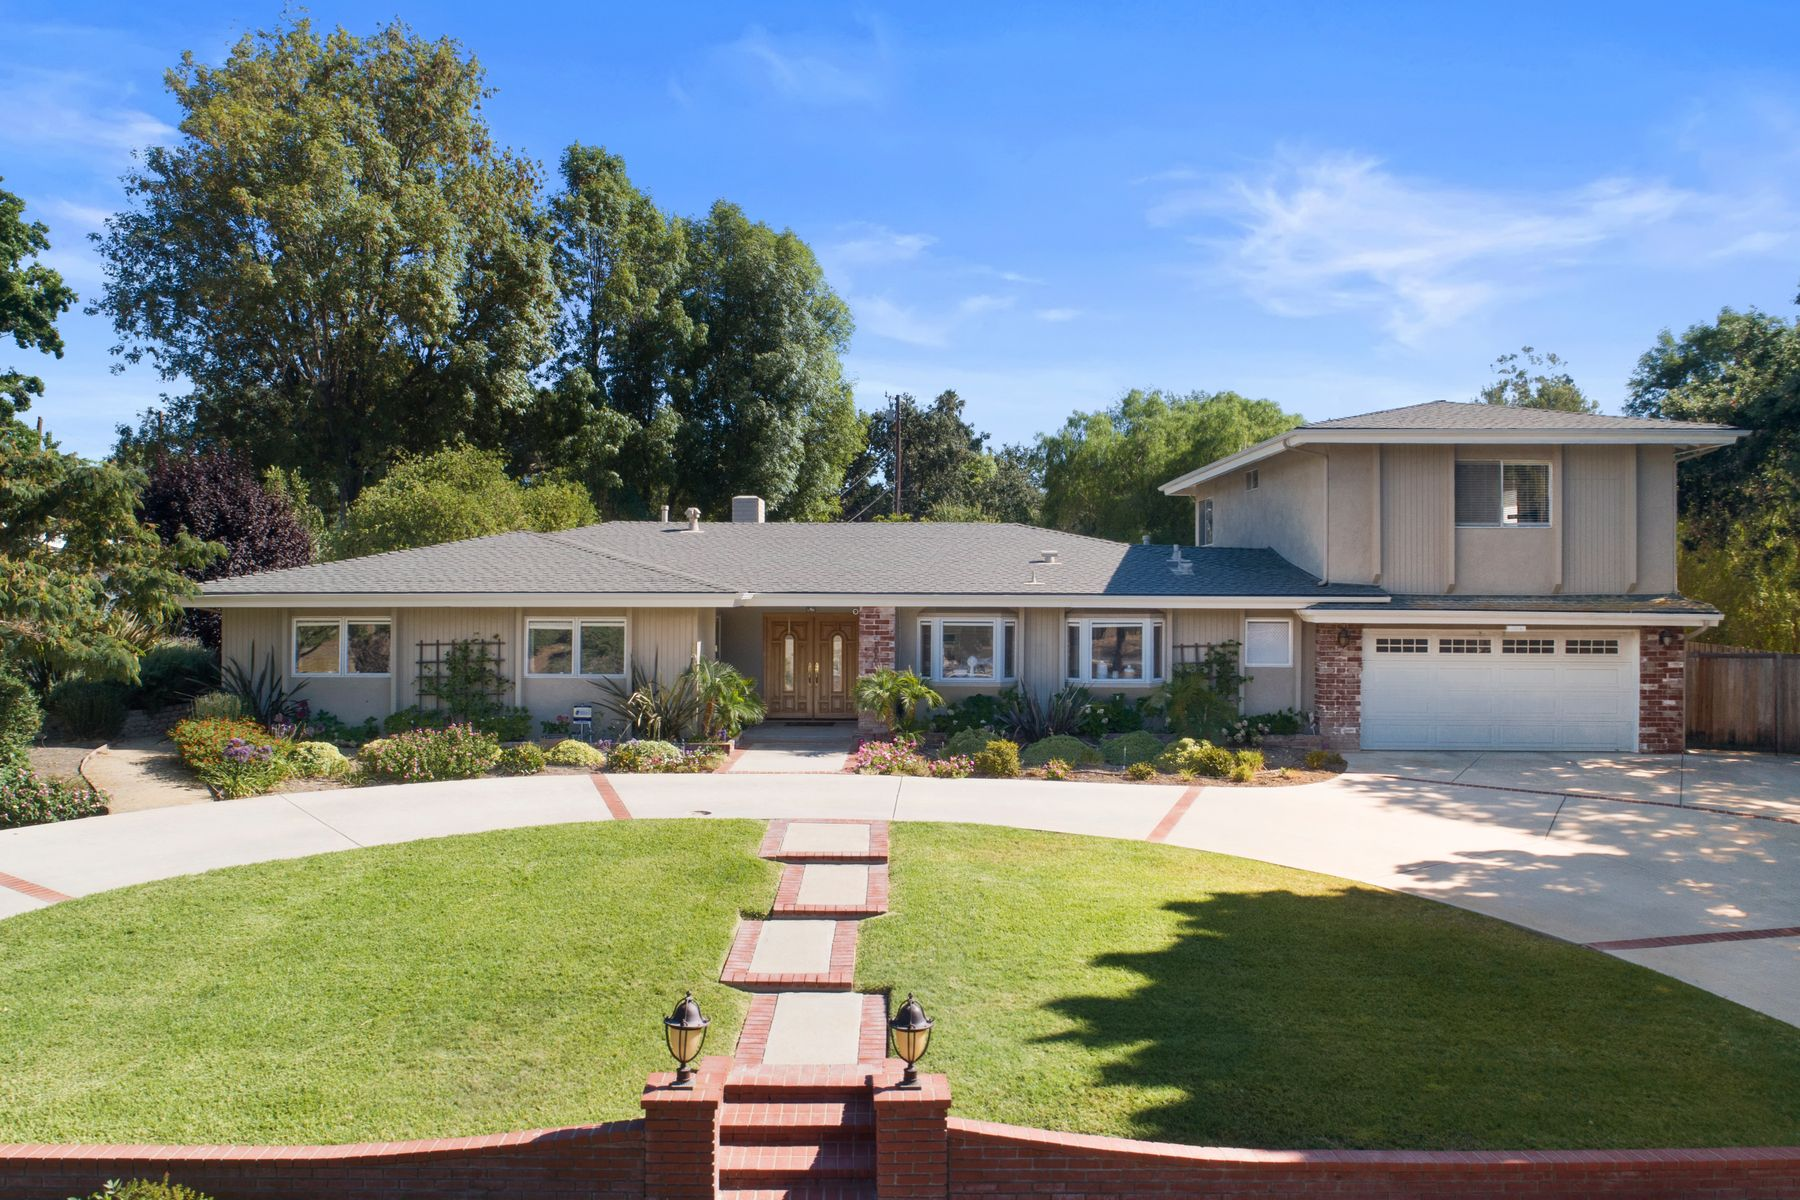 Single Family Homes for Sale at Beautiful Conejo Oaks Estates 1566 La Granada Drive Thousand Oaks, California 91362 United States